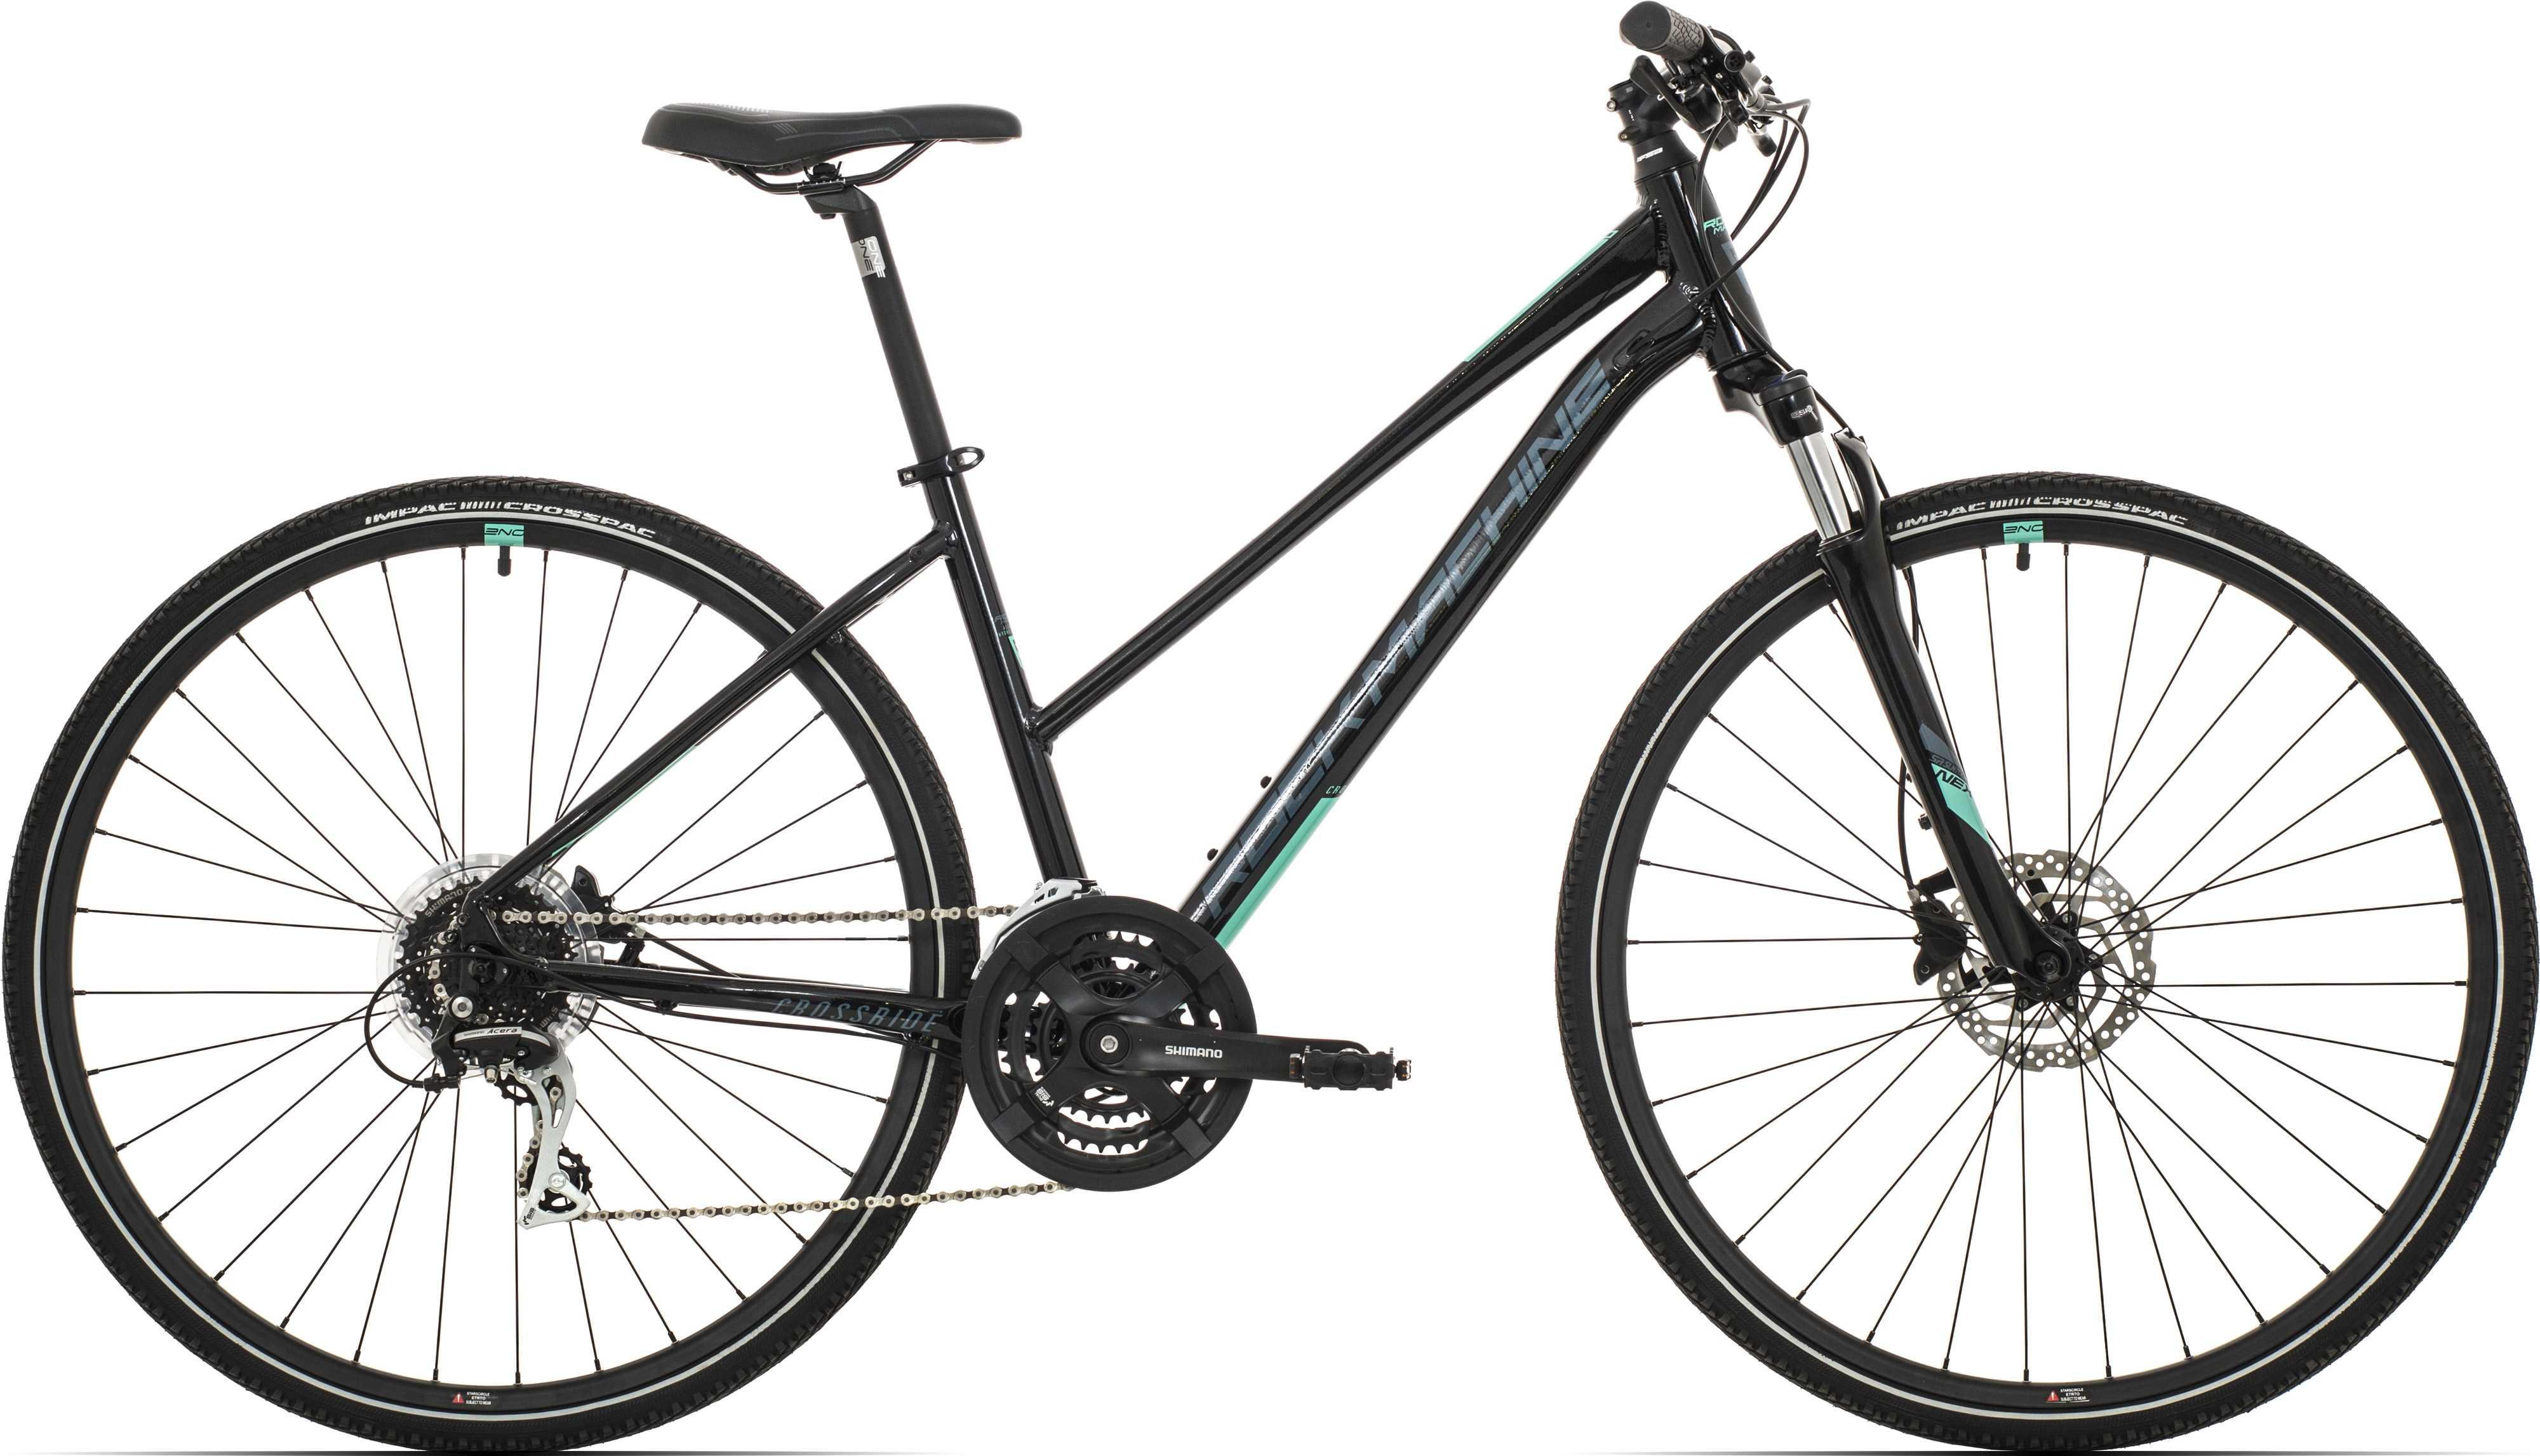 Rock Machine Crossride 300 Lady svart/mintgrön/grå medium